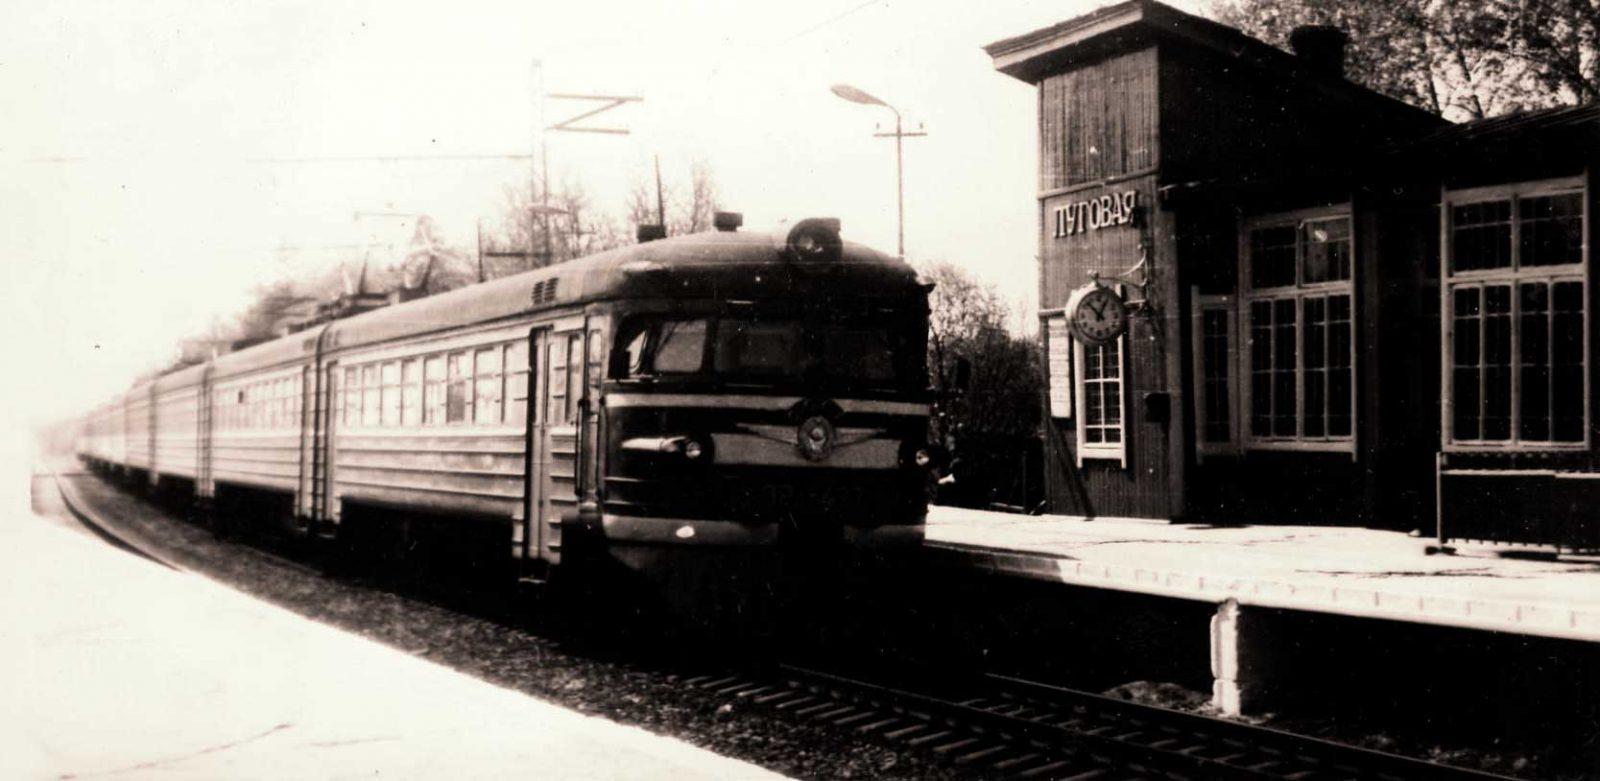 Станция Луговая - электричка, 1960-70